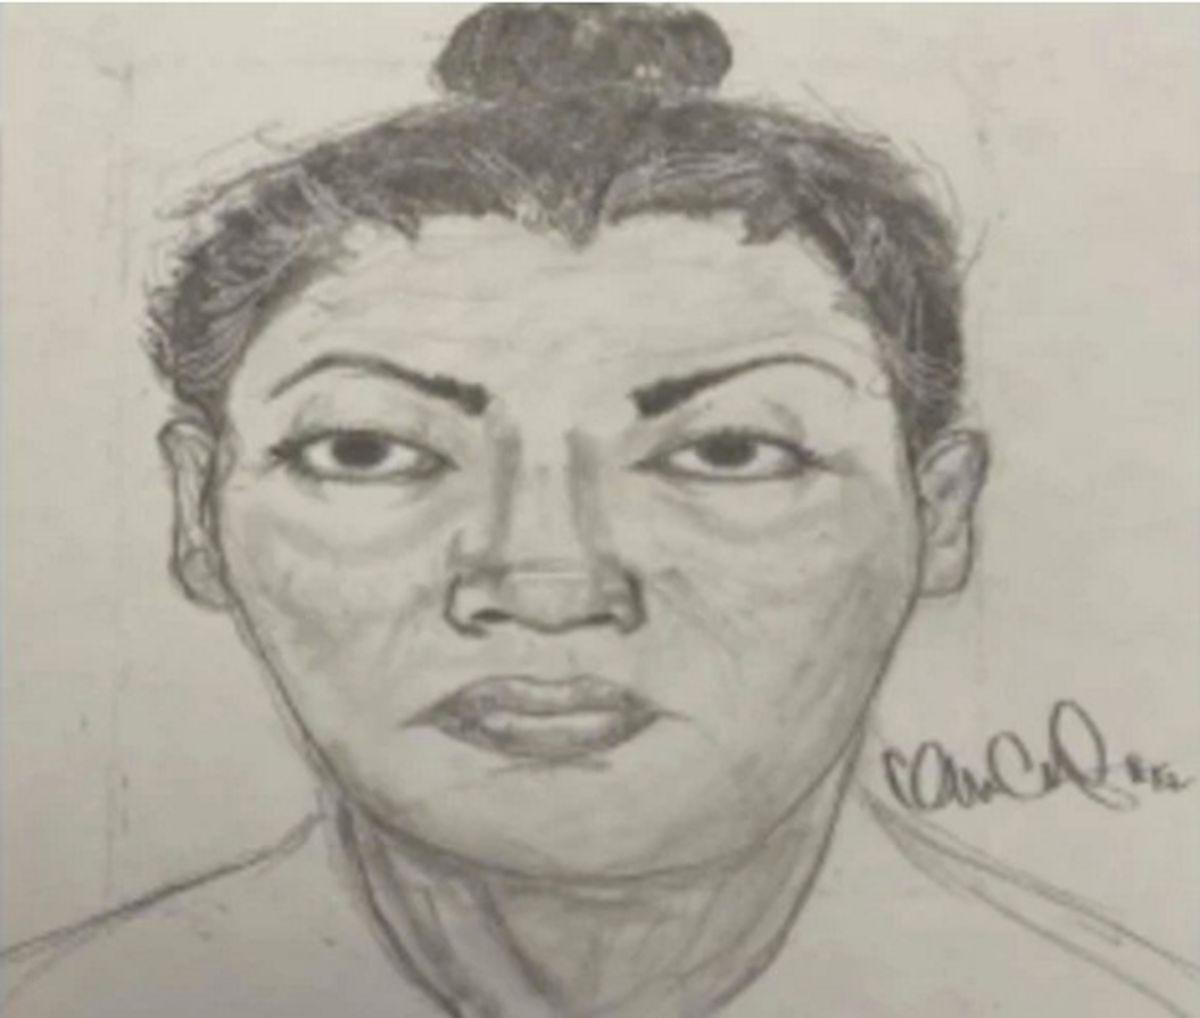 Buscan a sospechosos que presuntamente intentaron secuestrar a un niña en Brighton Park en Chicago